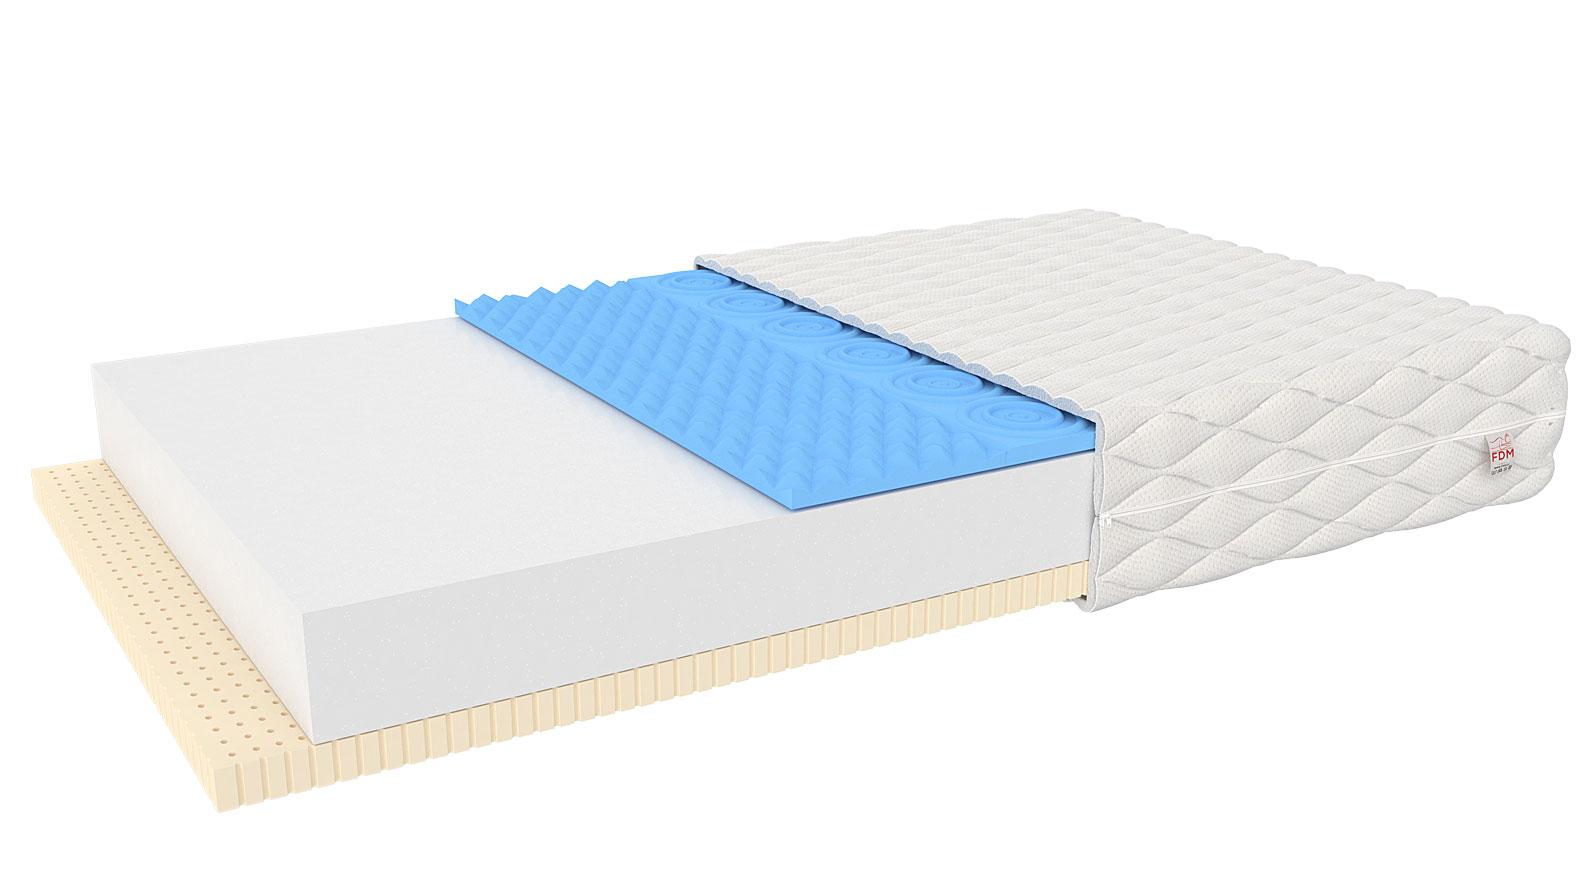 FDM Matrac Neapol Prevedenie: 160 x 200 cm